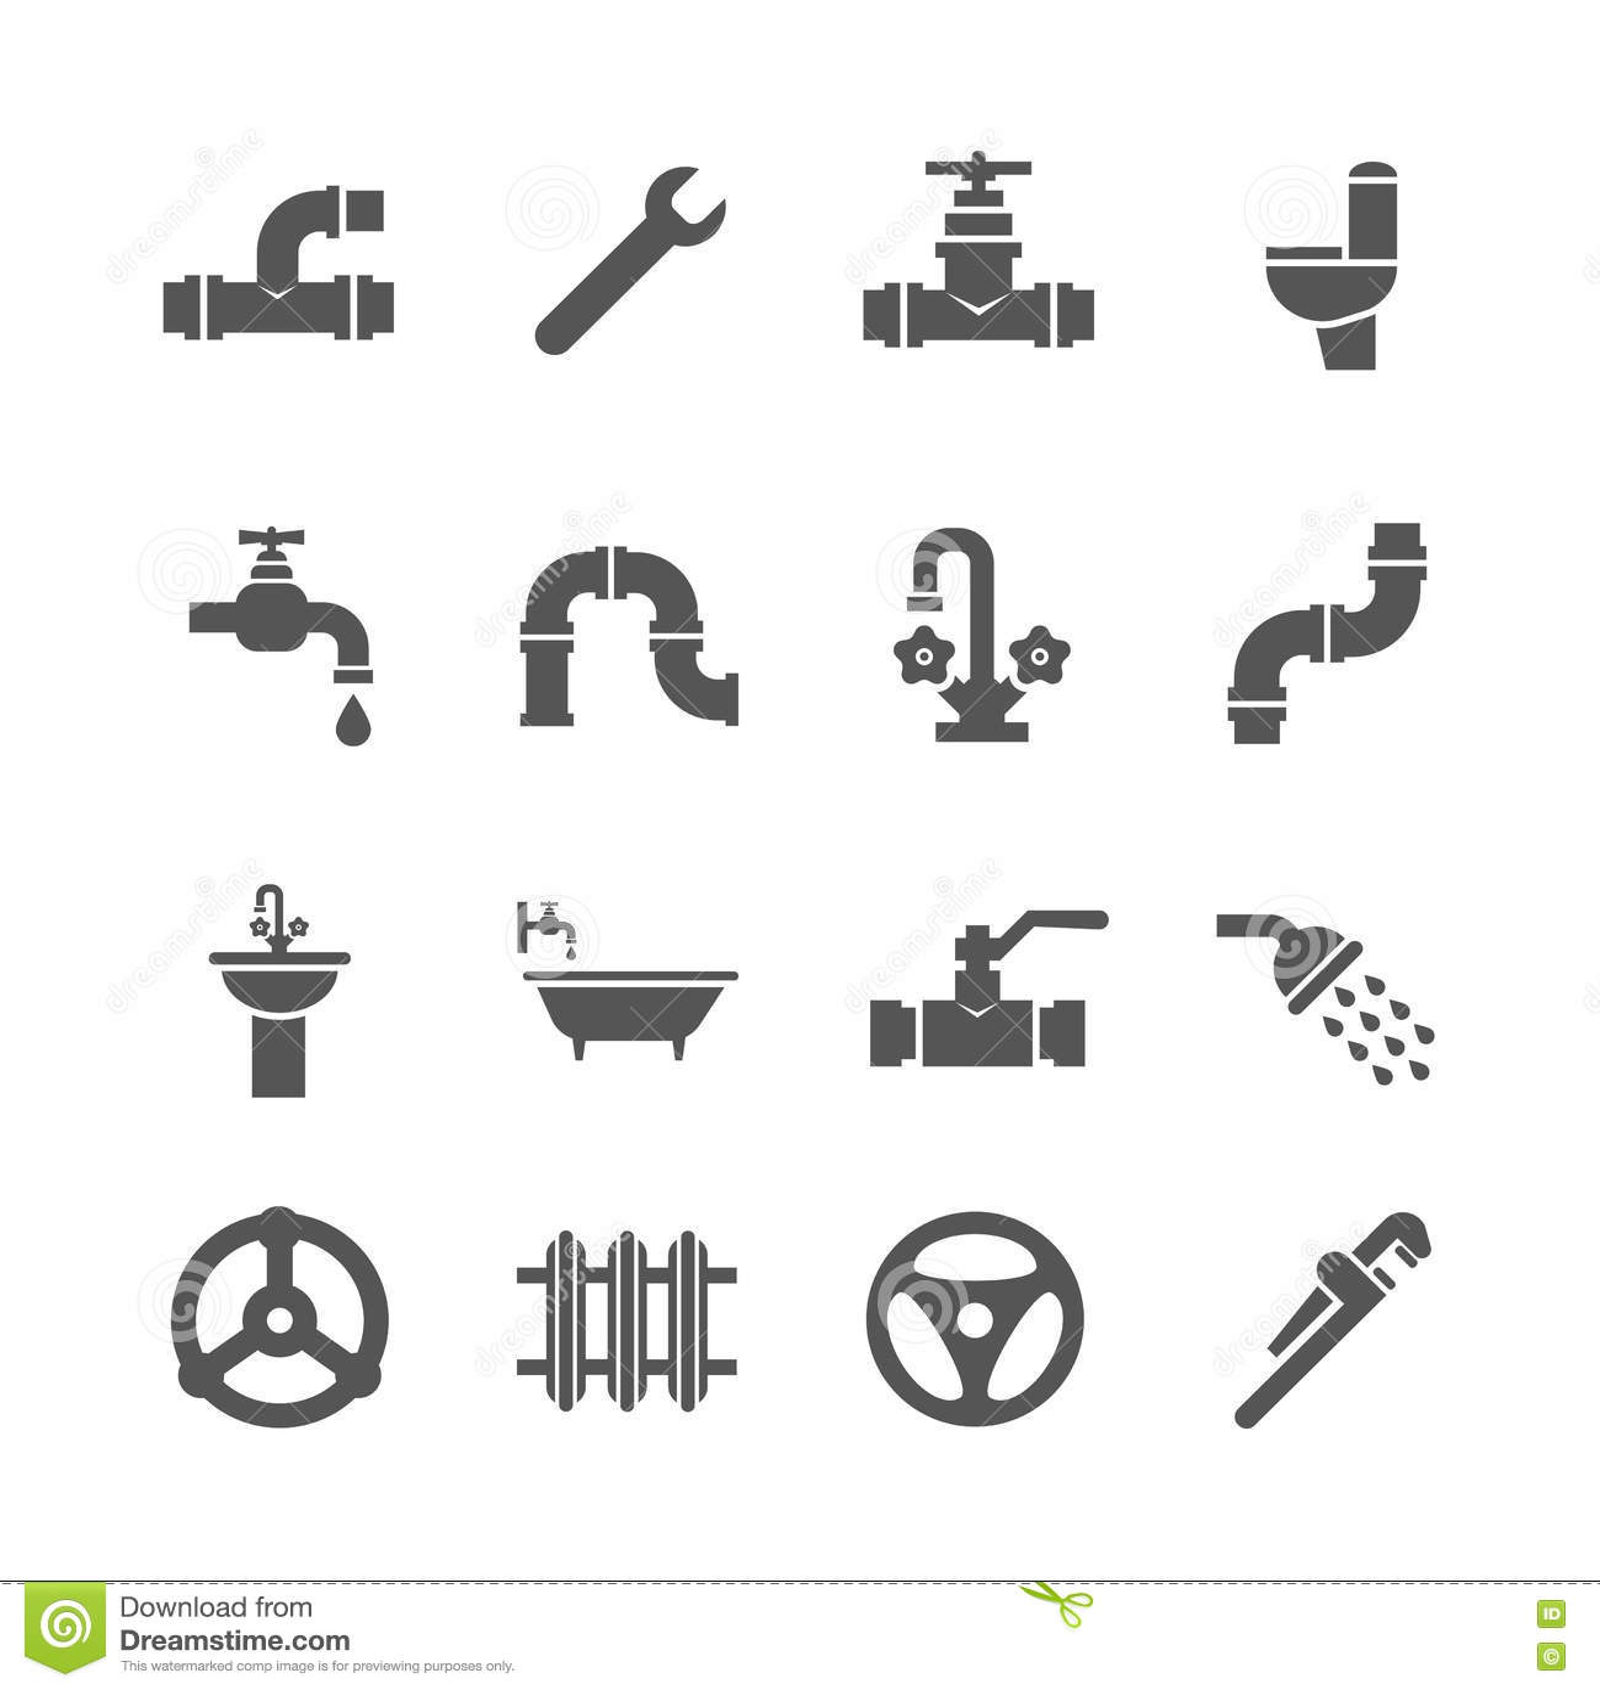 Plumbing Service Objects Tools Bathroom Sanitary